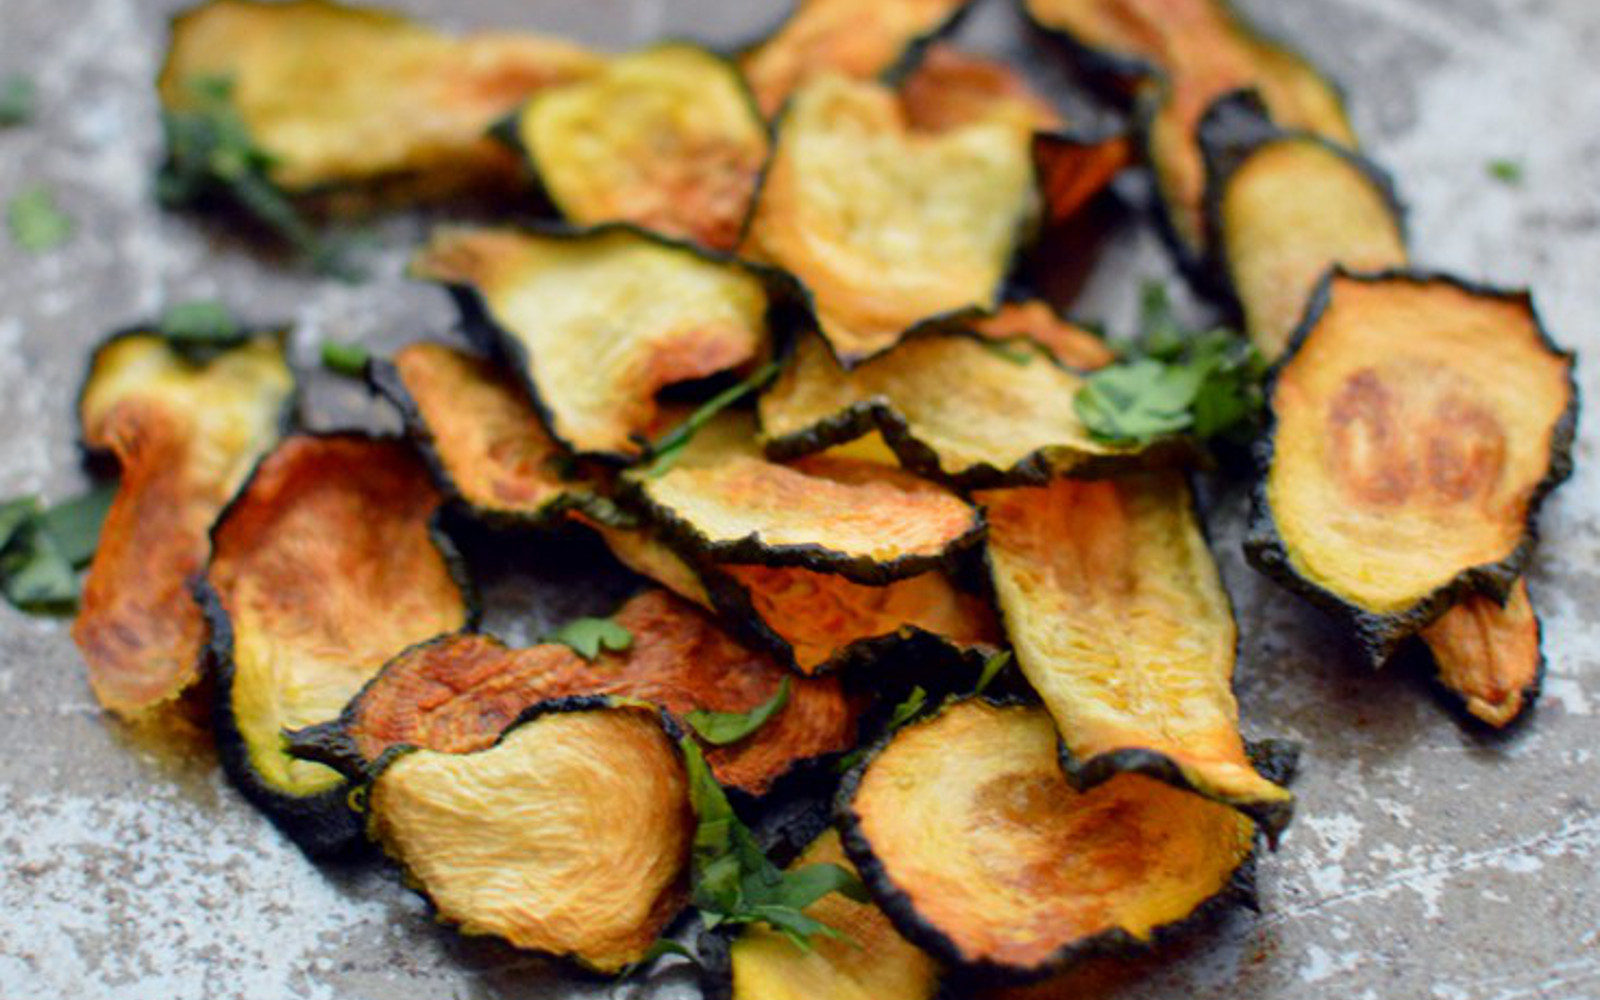 Vegan Gluten-Free Crispy Baked Zucchini Chips